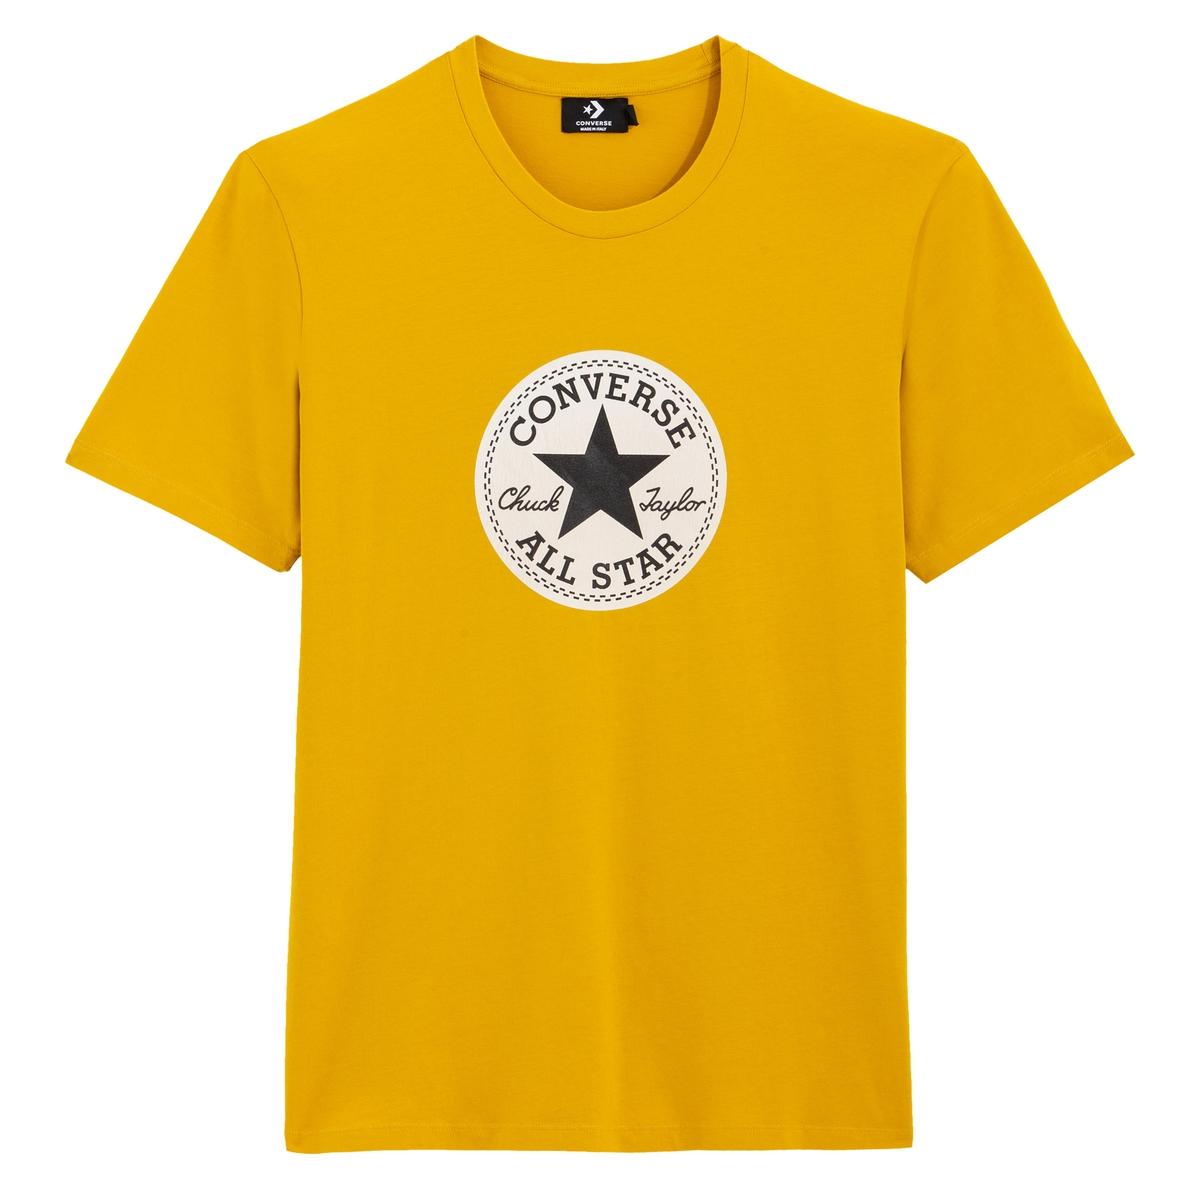 T-shirt de gola redonda, mangas curtas, All Star